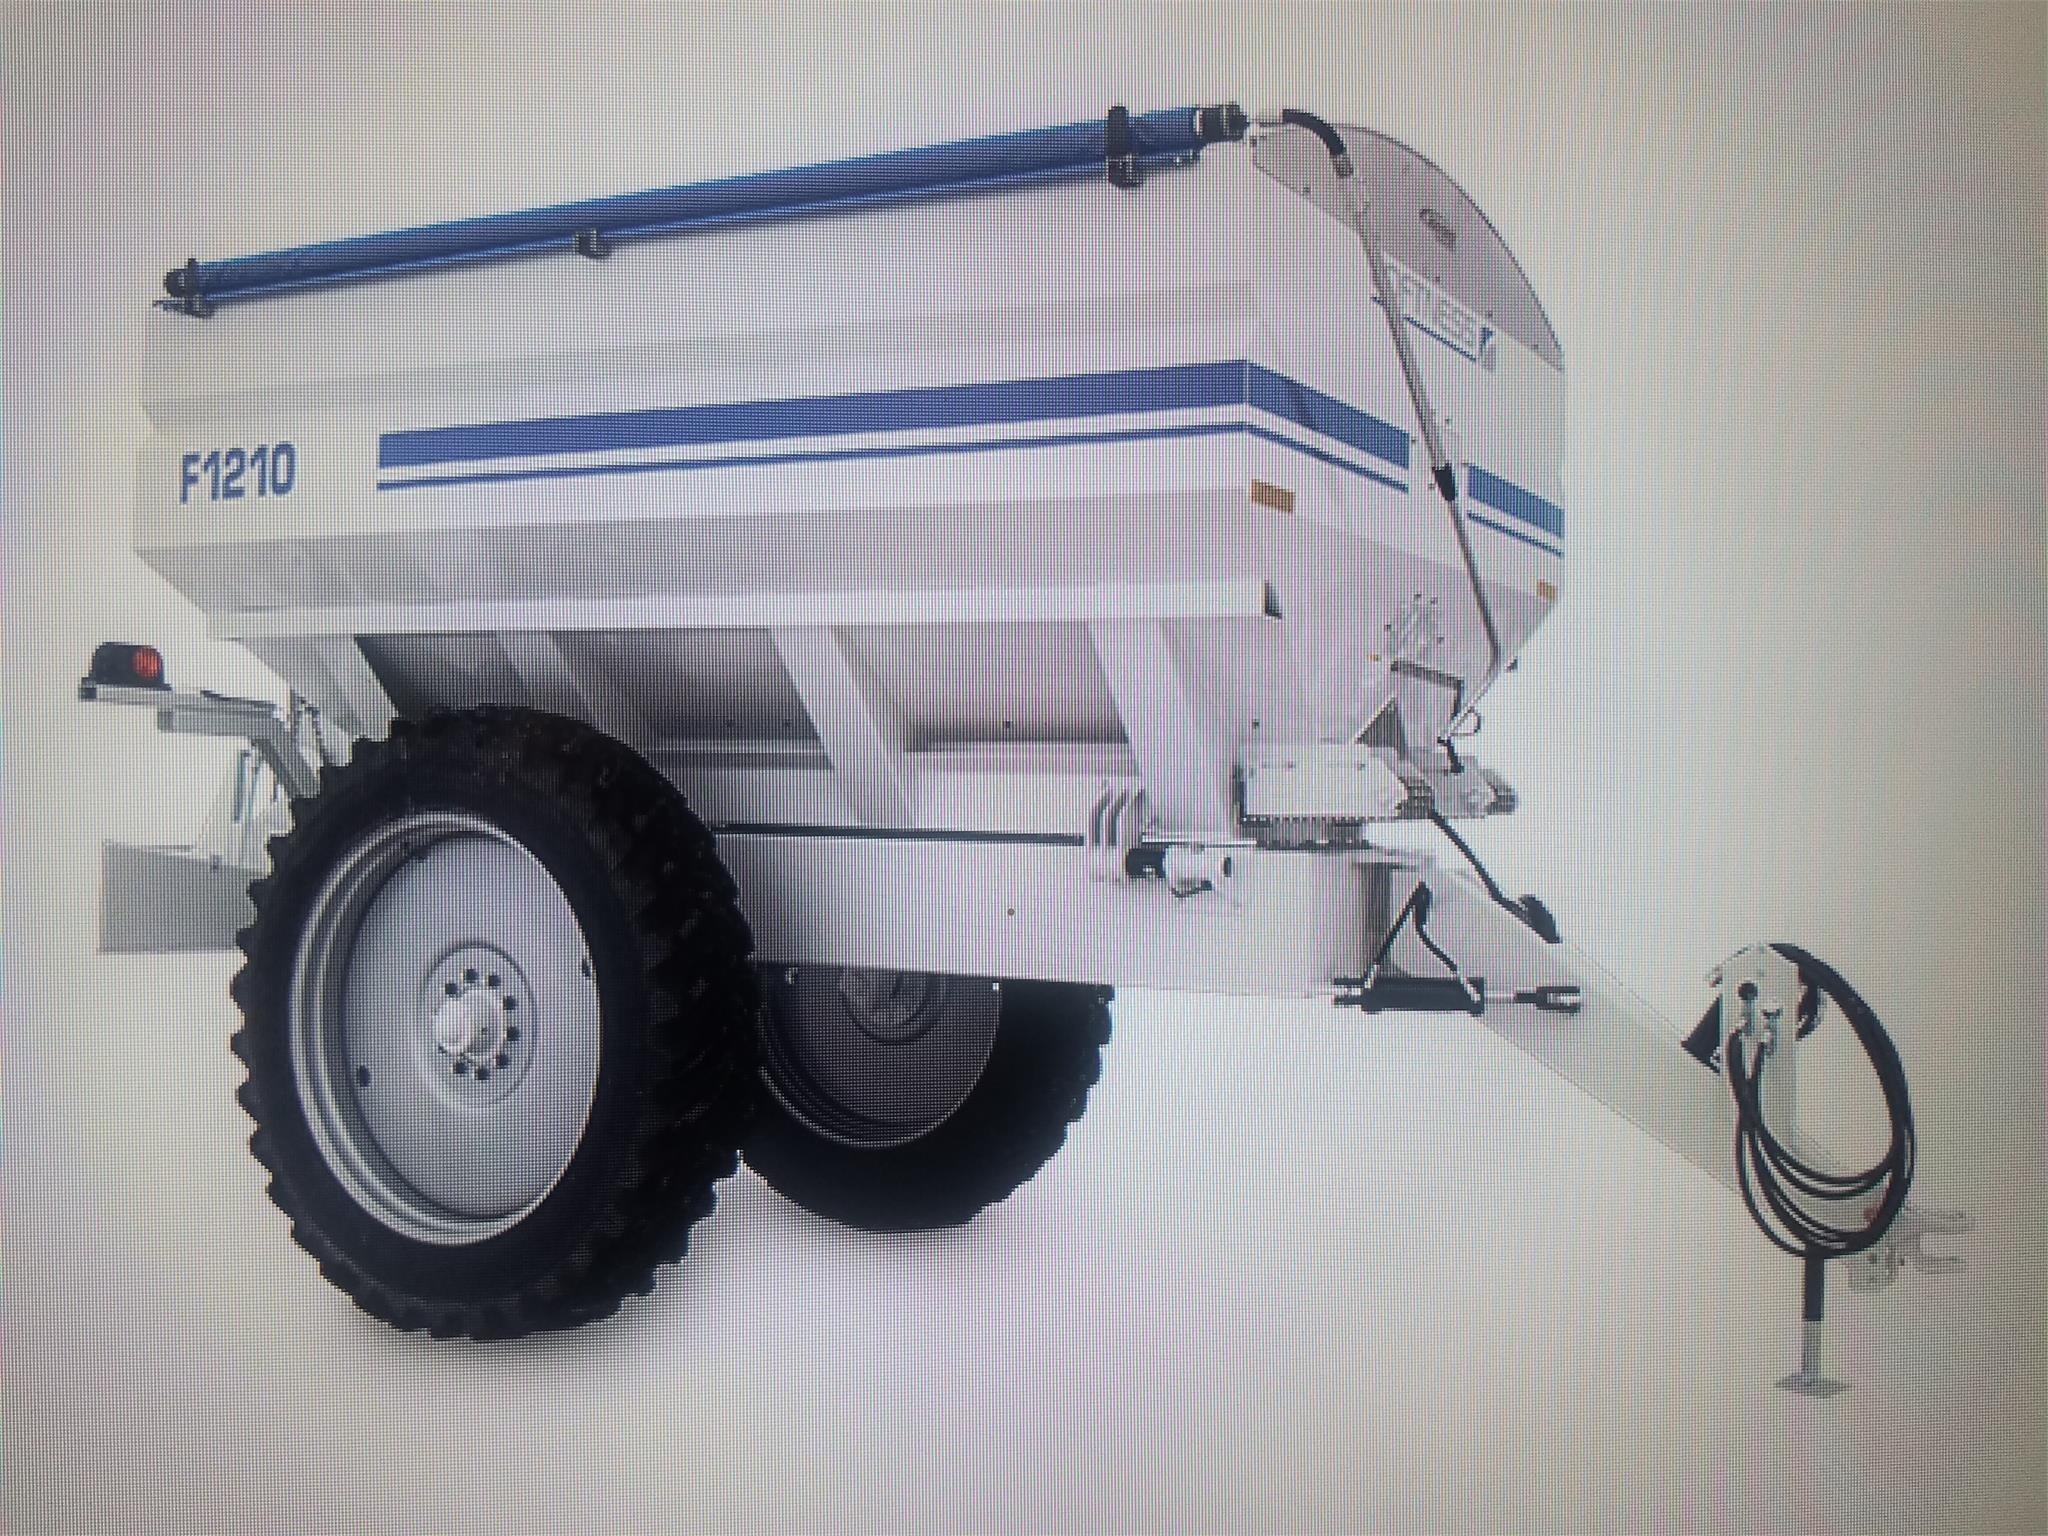 2020 Loftness F1210 Pull-Type Fertilizer Spreader